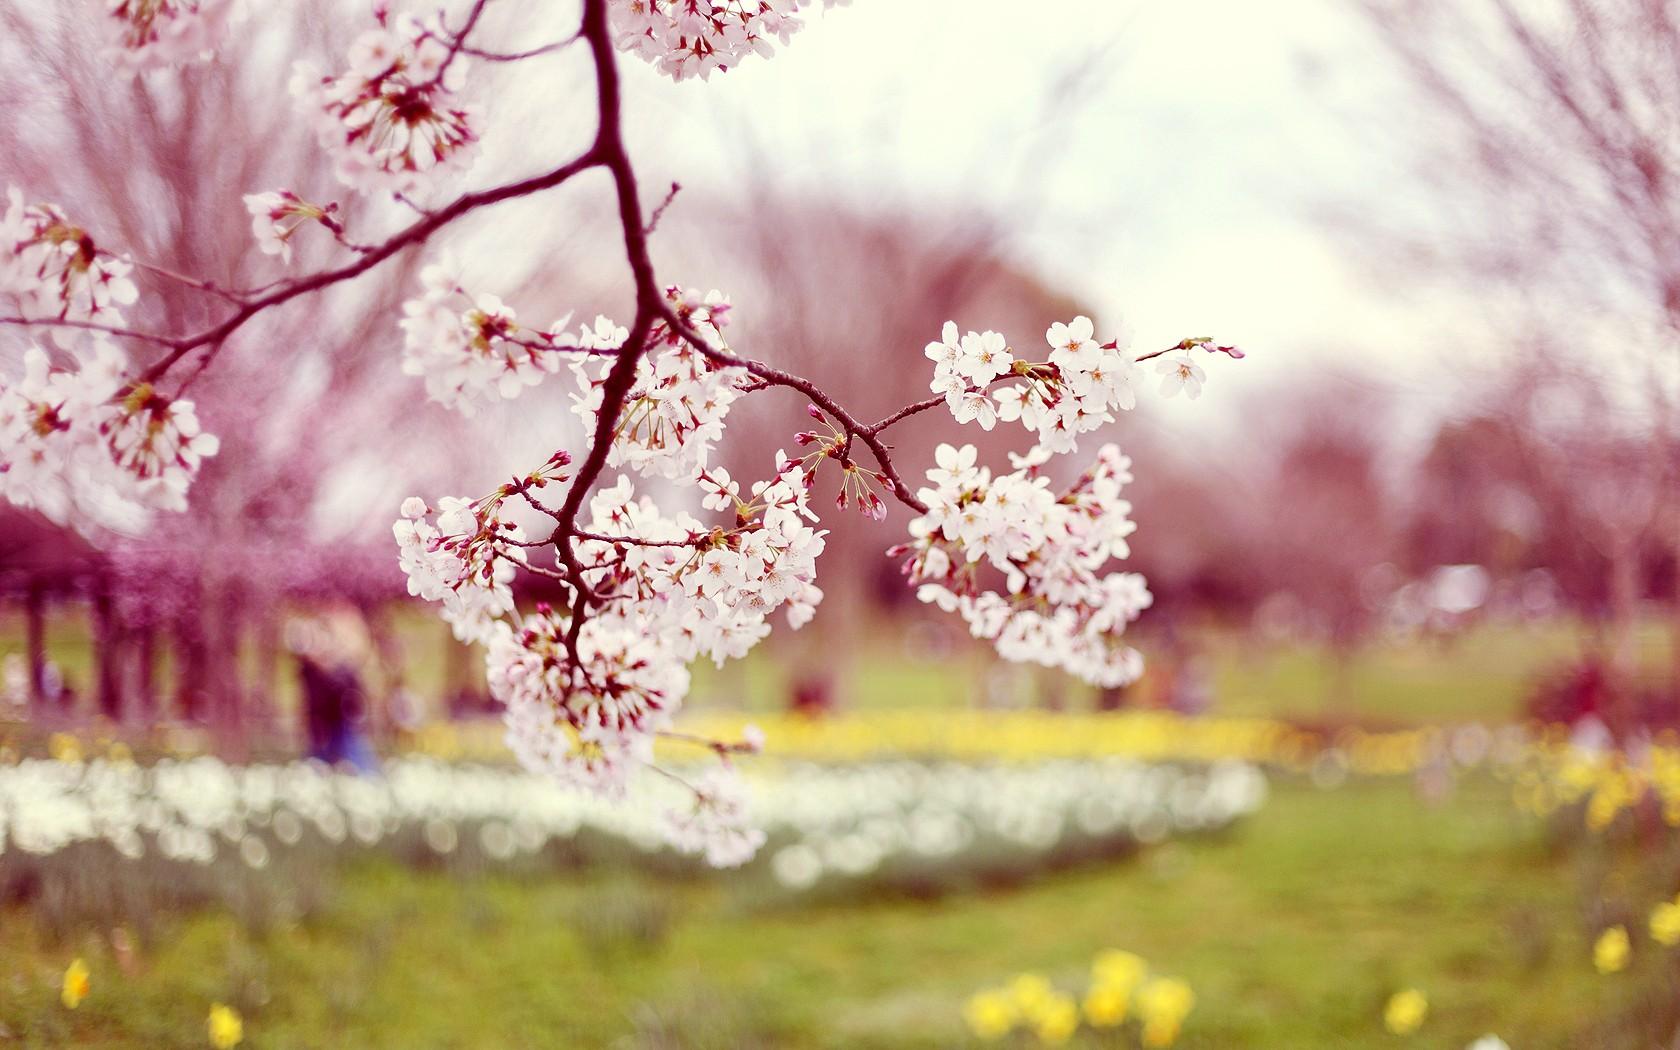 Flowers-spring-37265726-1680-1050